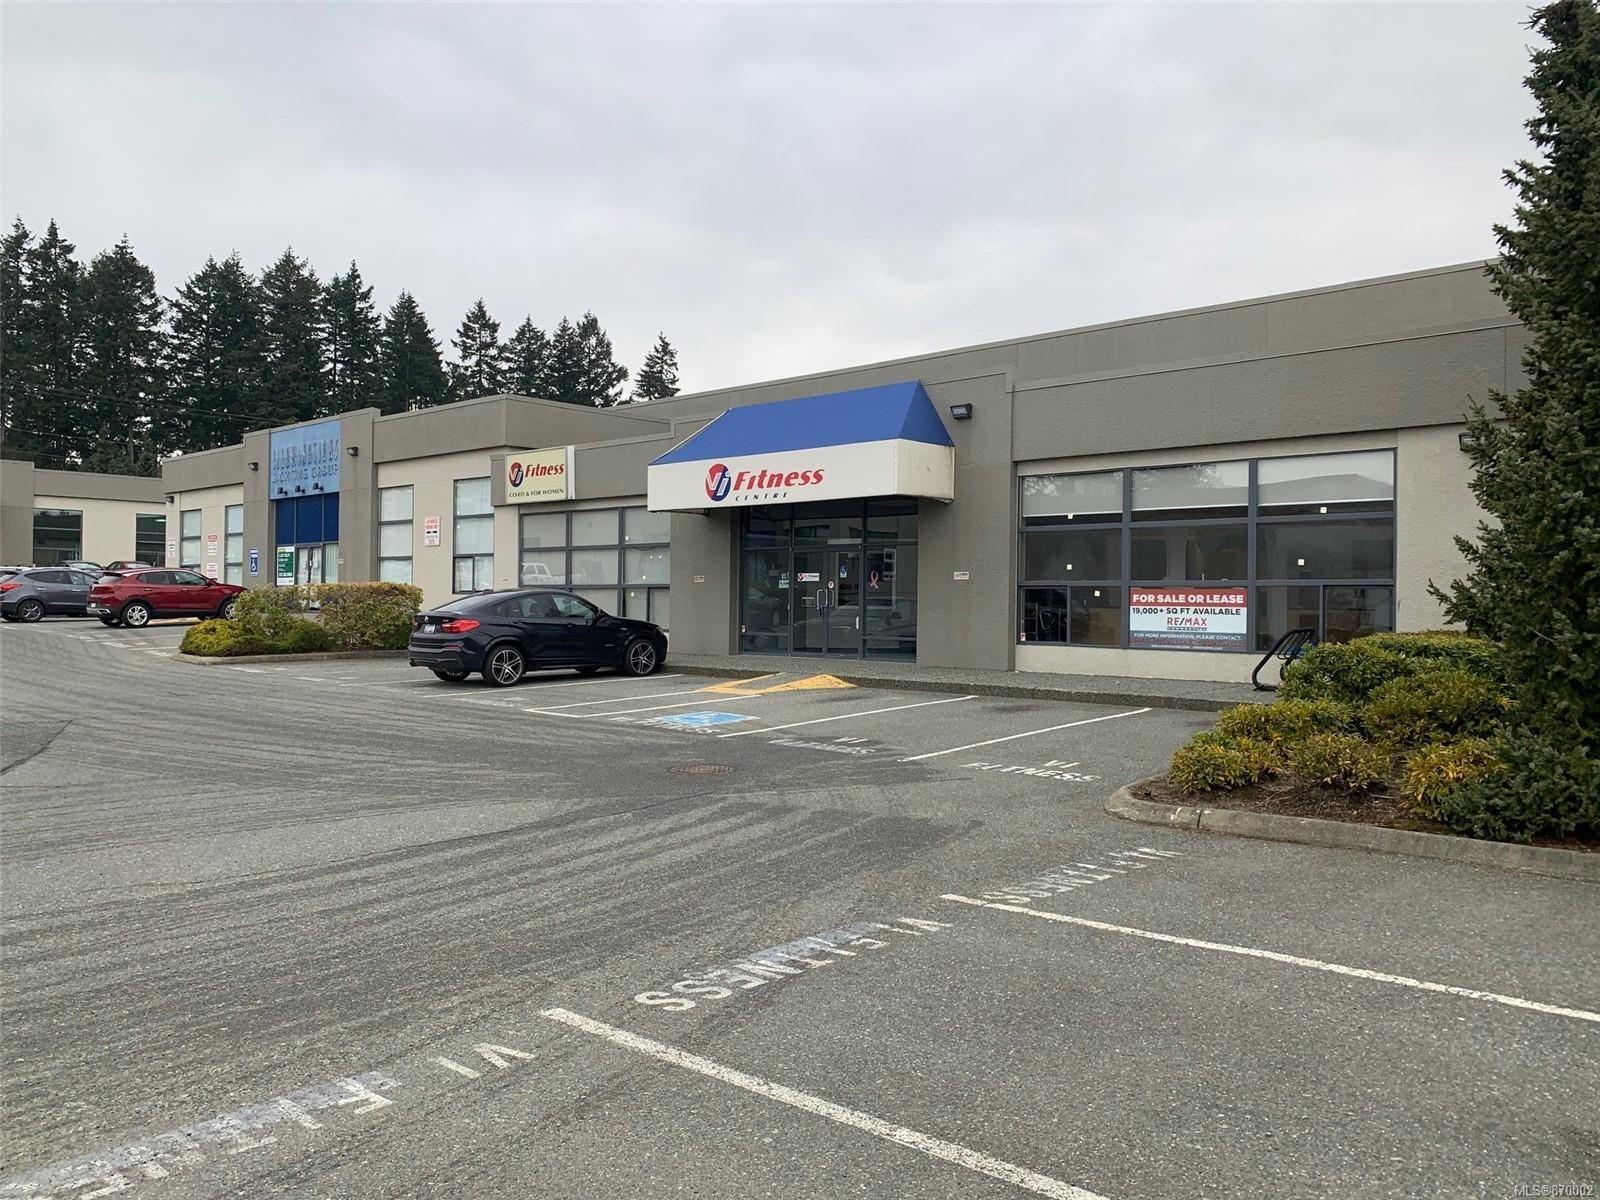 Main Photo: 201 4300 WELLINGTON Rd in : Na North Nanaimo Mixed Use for lease (Nanaimo)  : MLS®# 870002